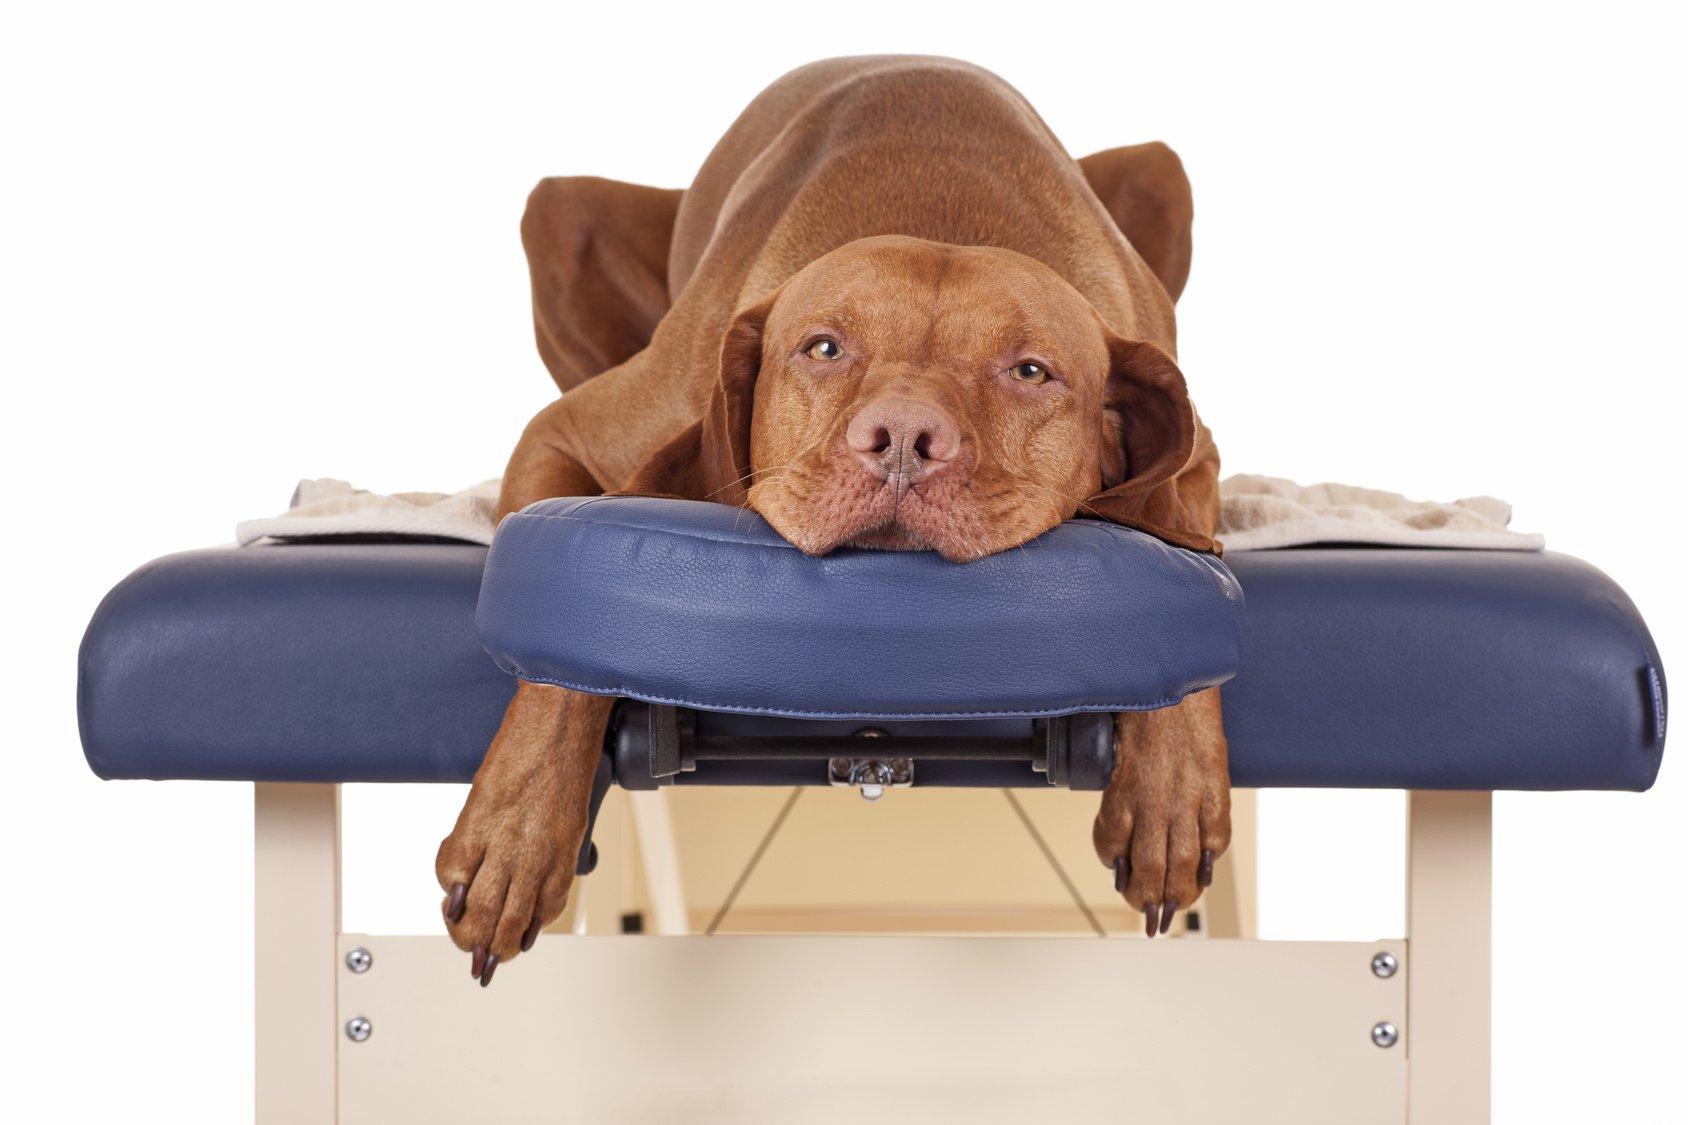 headaches waiting for my massage